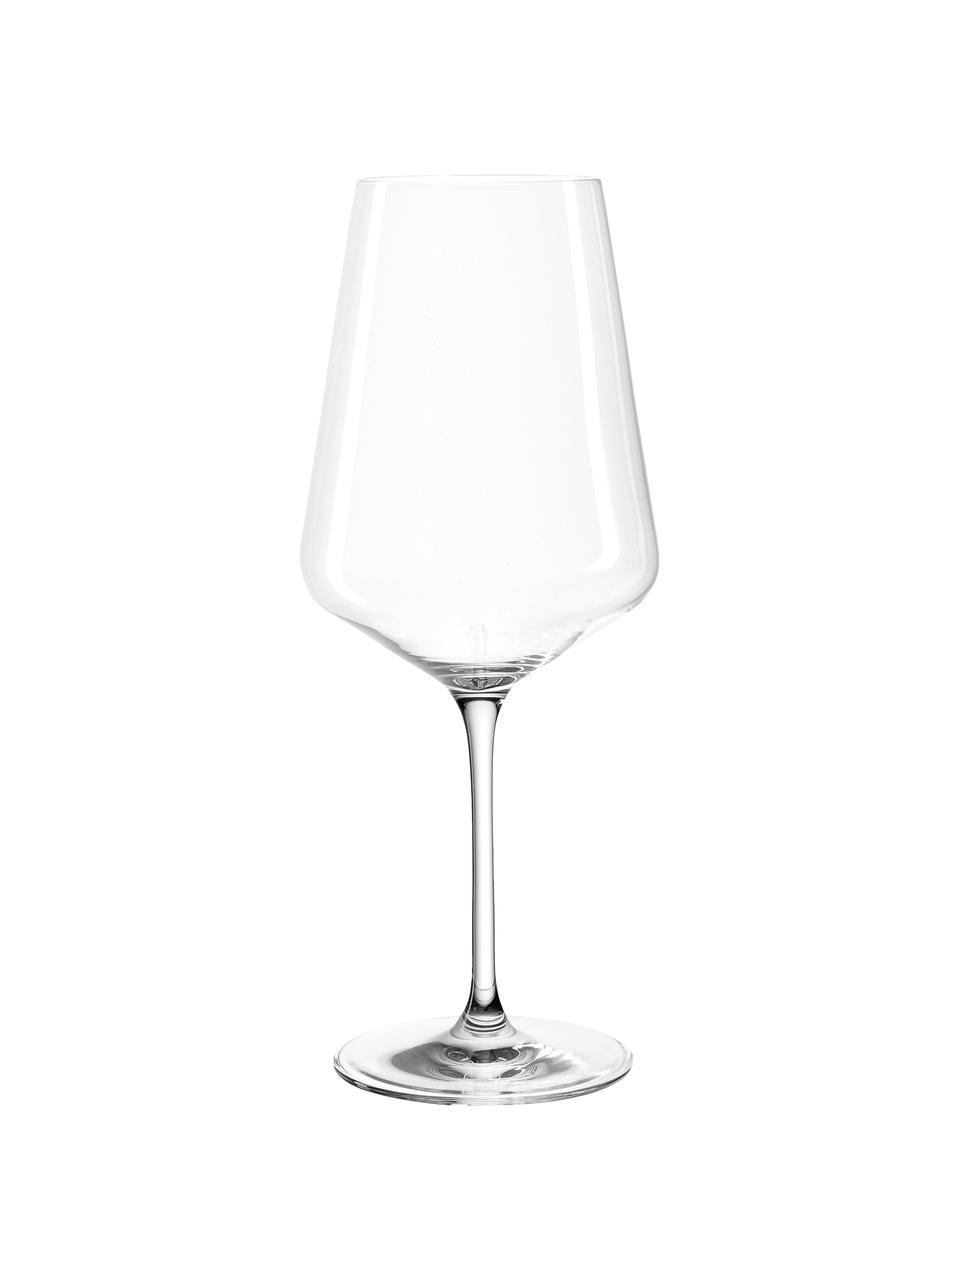 Rode wijnglazenset Puccini, 6-delig, Kristalglas, Transparant, Ø 11 x H 26 cm